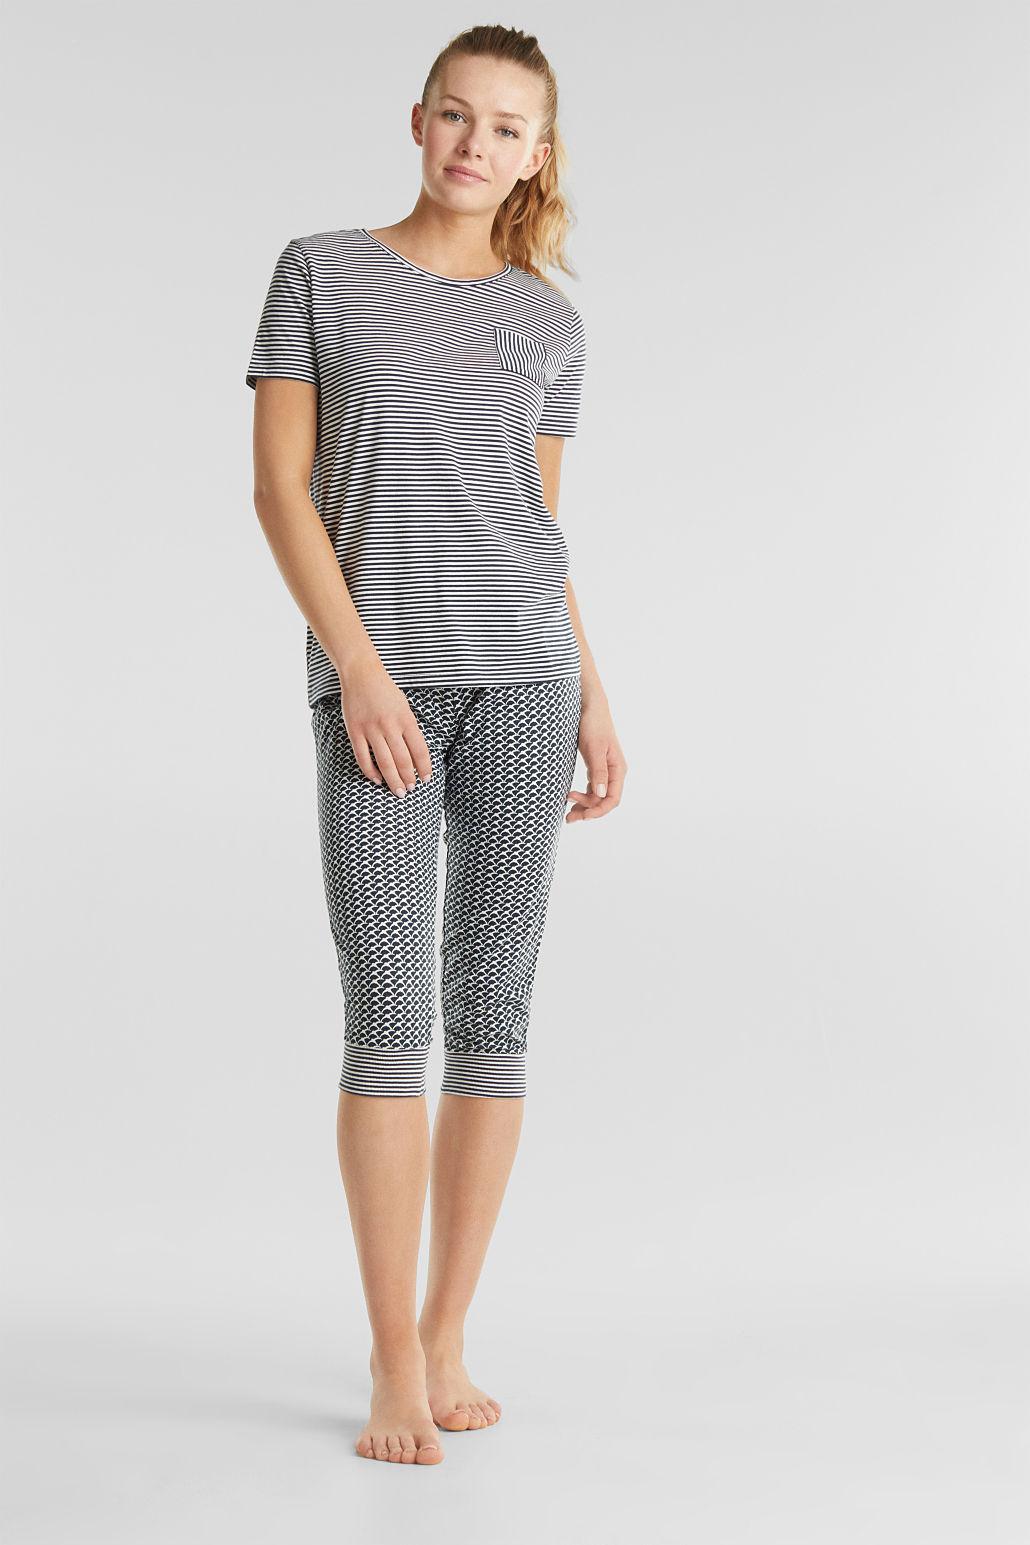 Esprit Cassie Pyjama dames